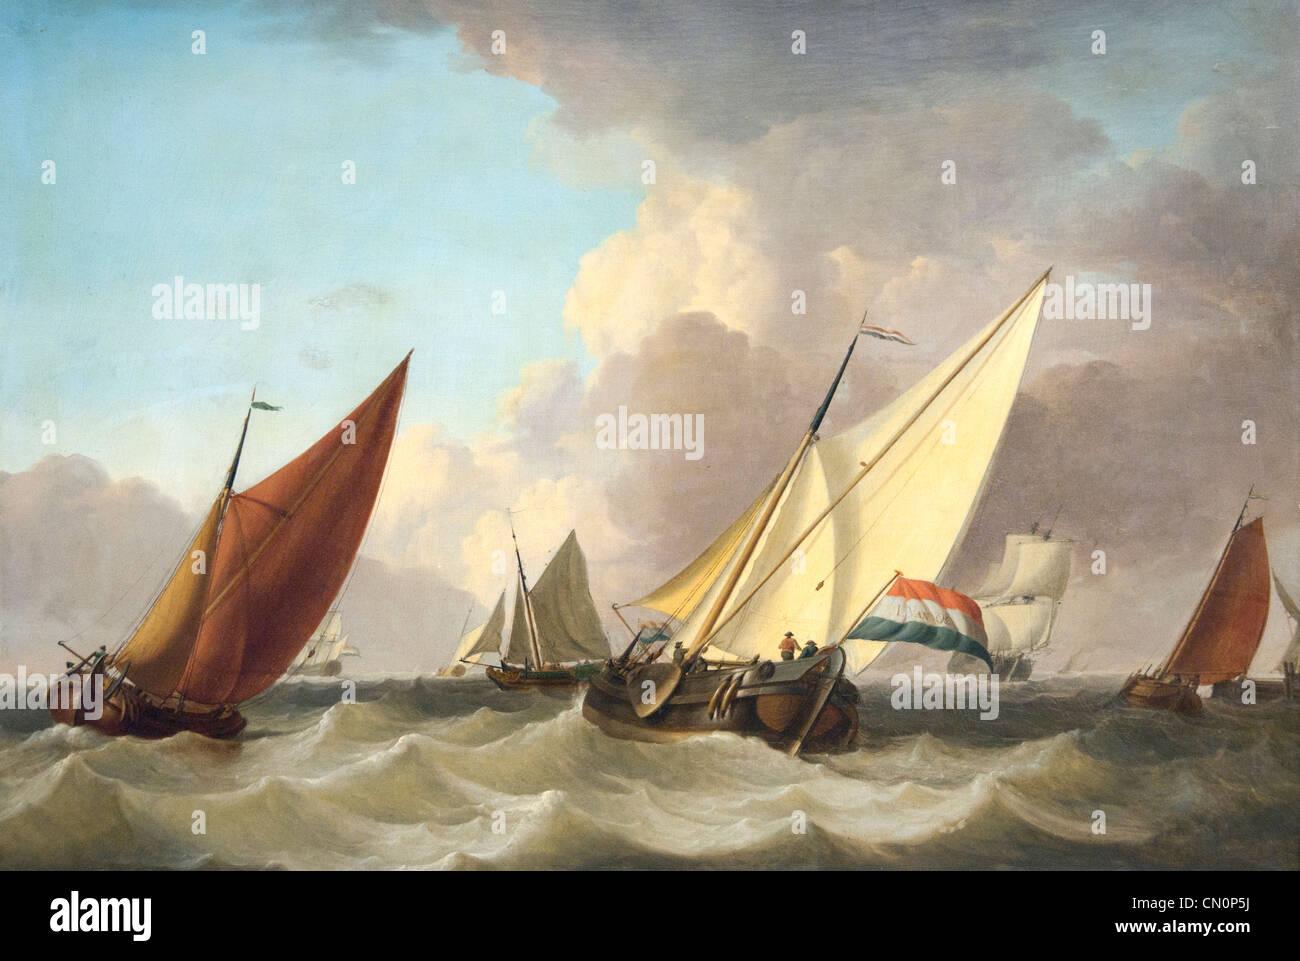 Le navi olandesi nella brezza di Jan van Os 1744 - 1808 Paesi Bassi Paesi Bassi Immagini Stock